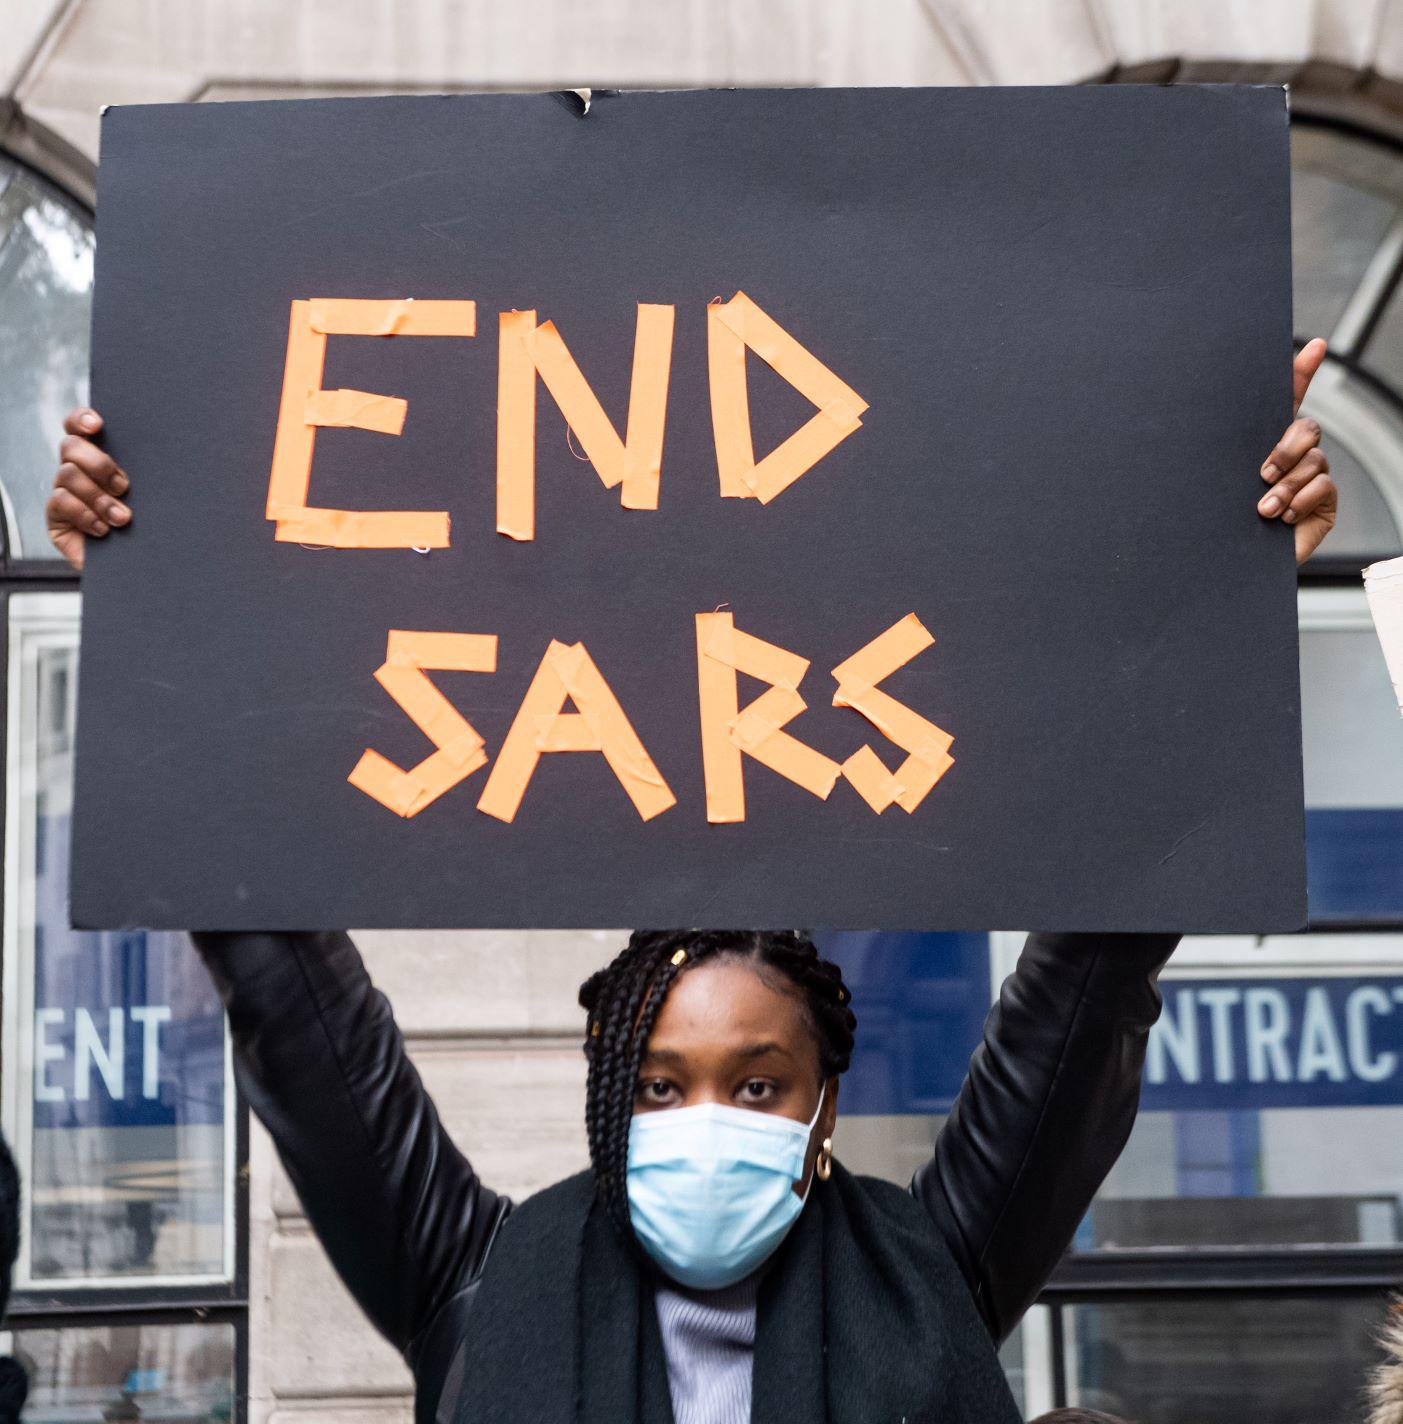 Naija Lives Matter: #EndSars and the Violence After